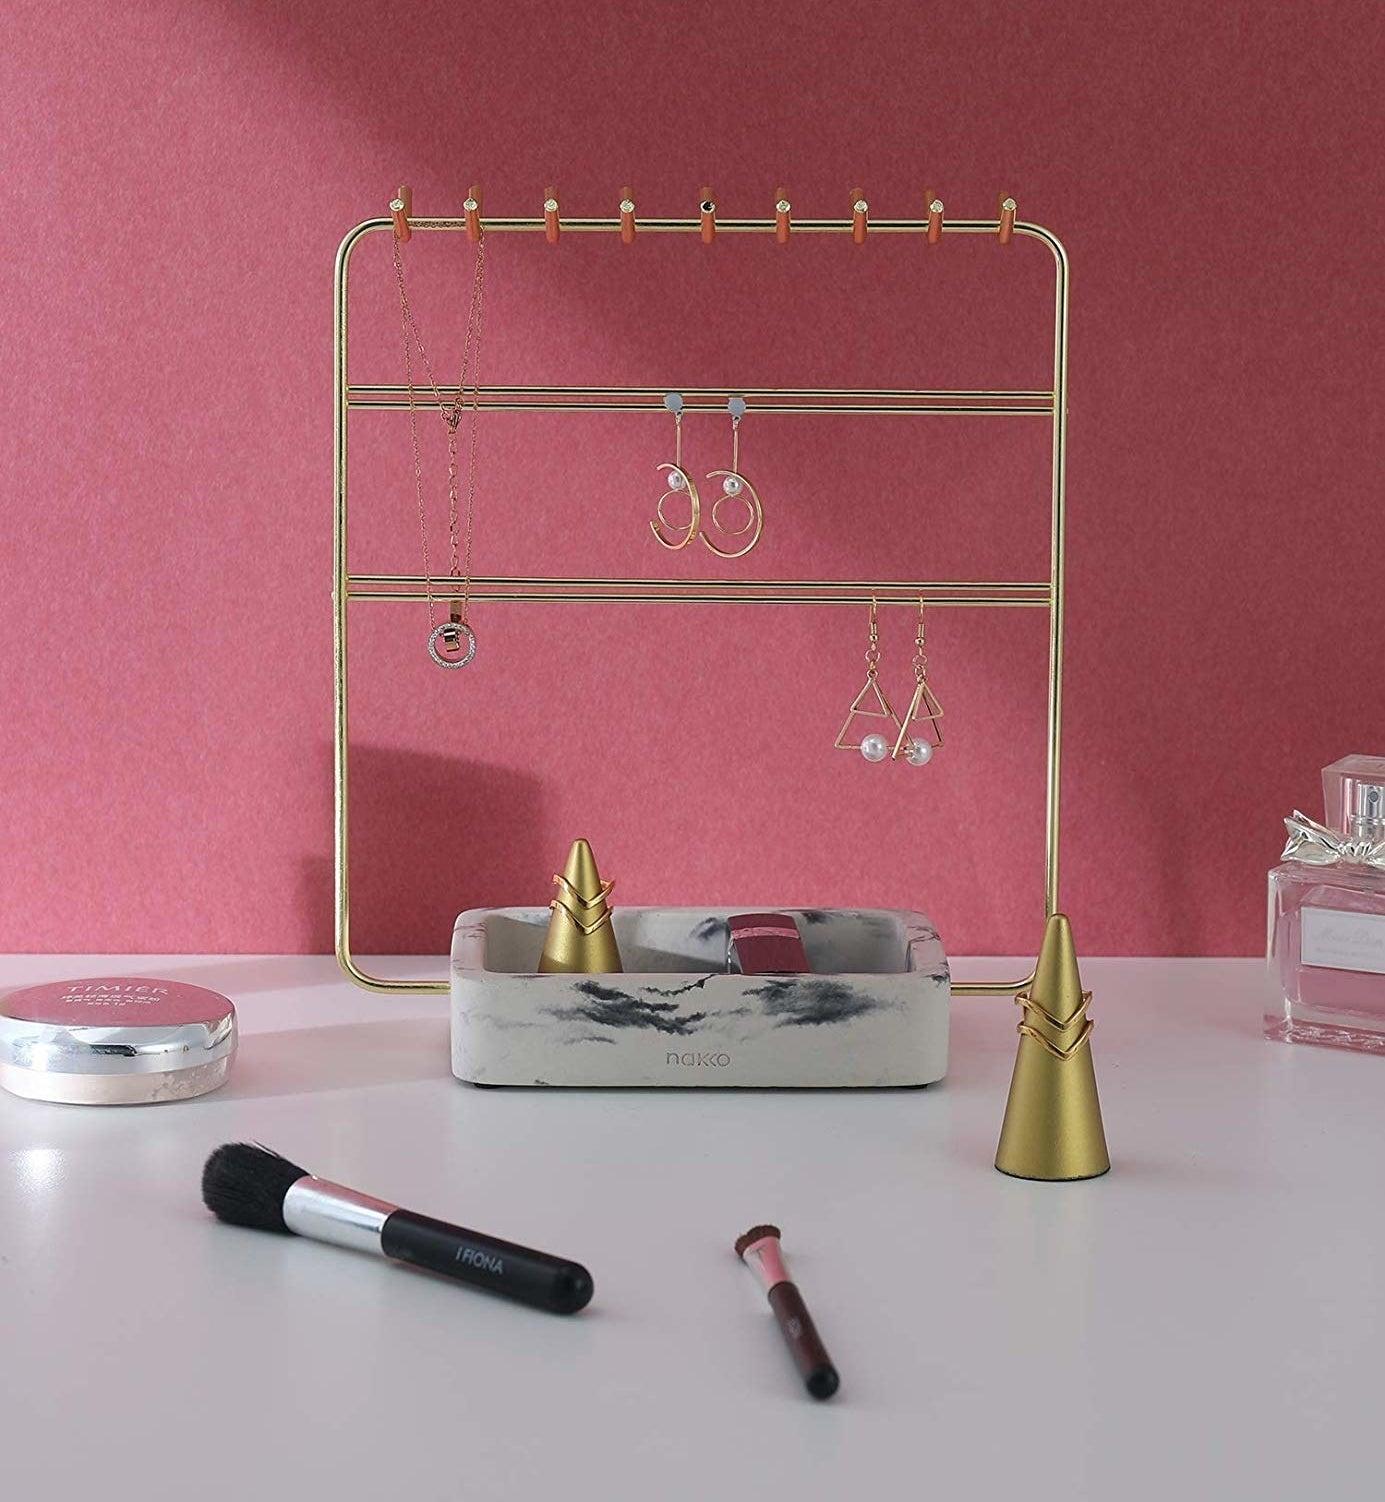 The Nakko Modern Jewelry Organizer in gold